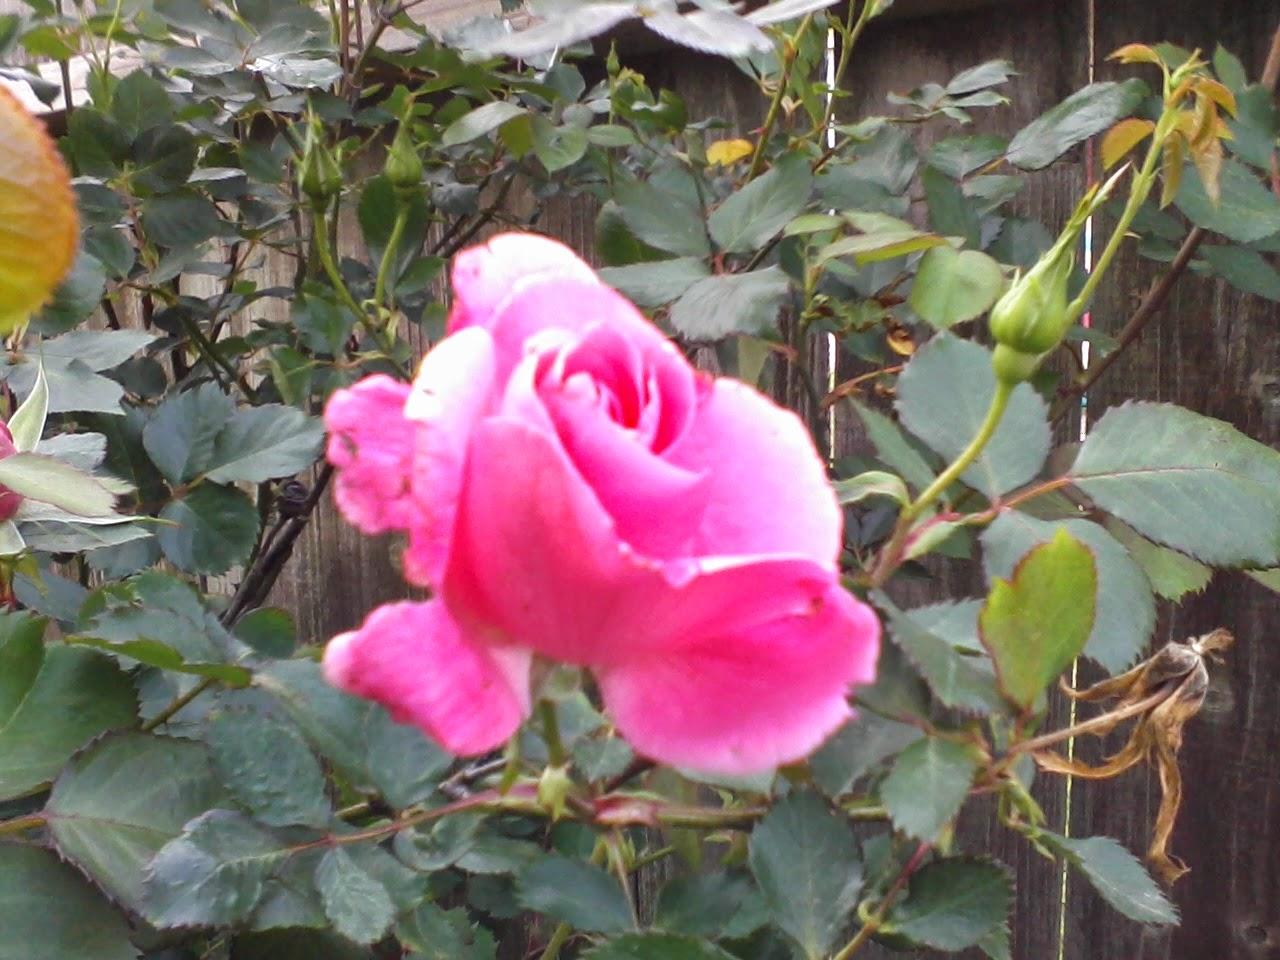 Gardening 2014 - 0404190718.jpg